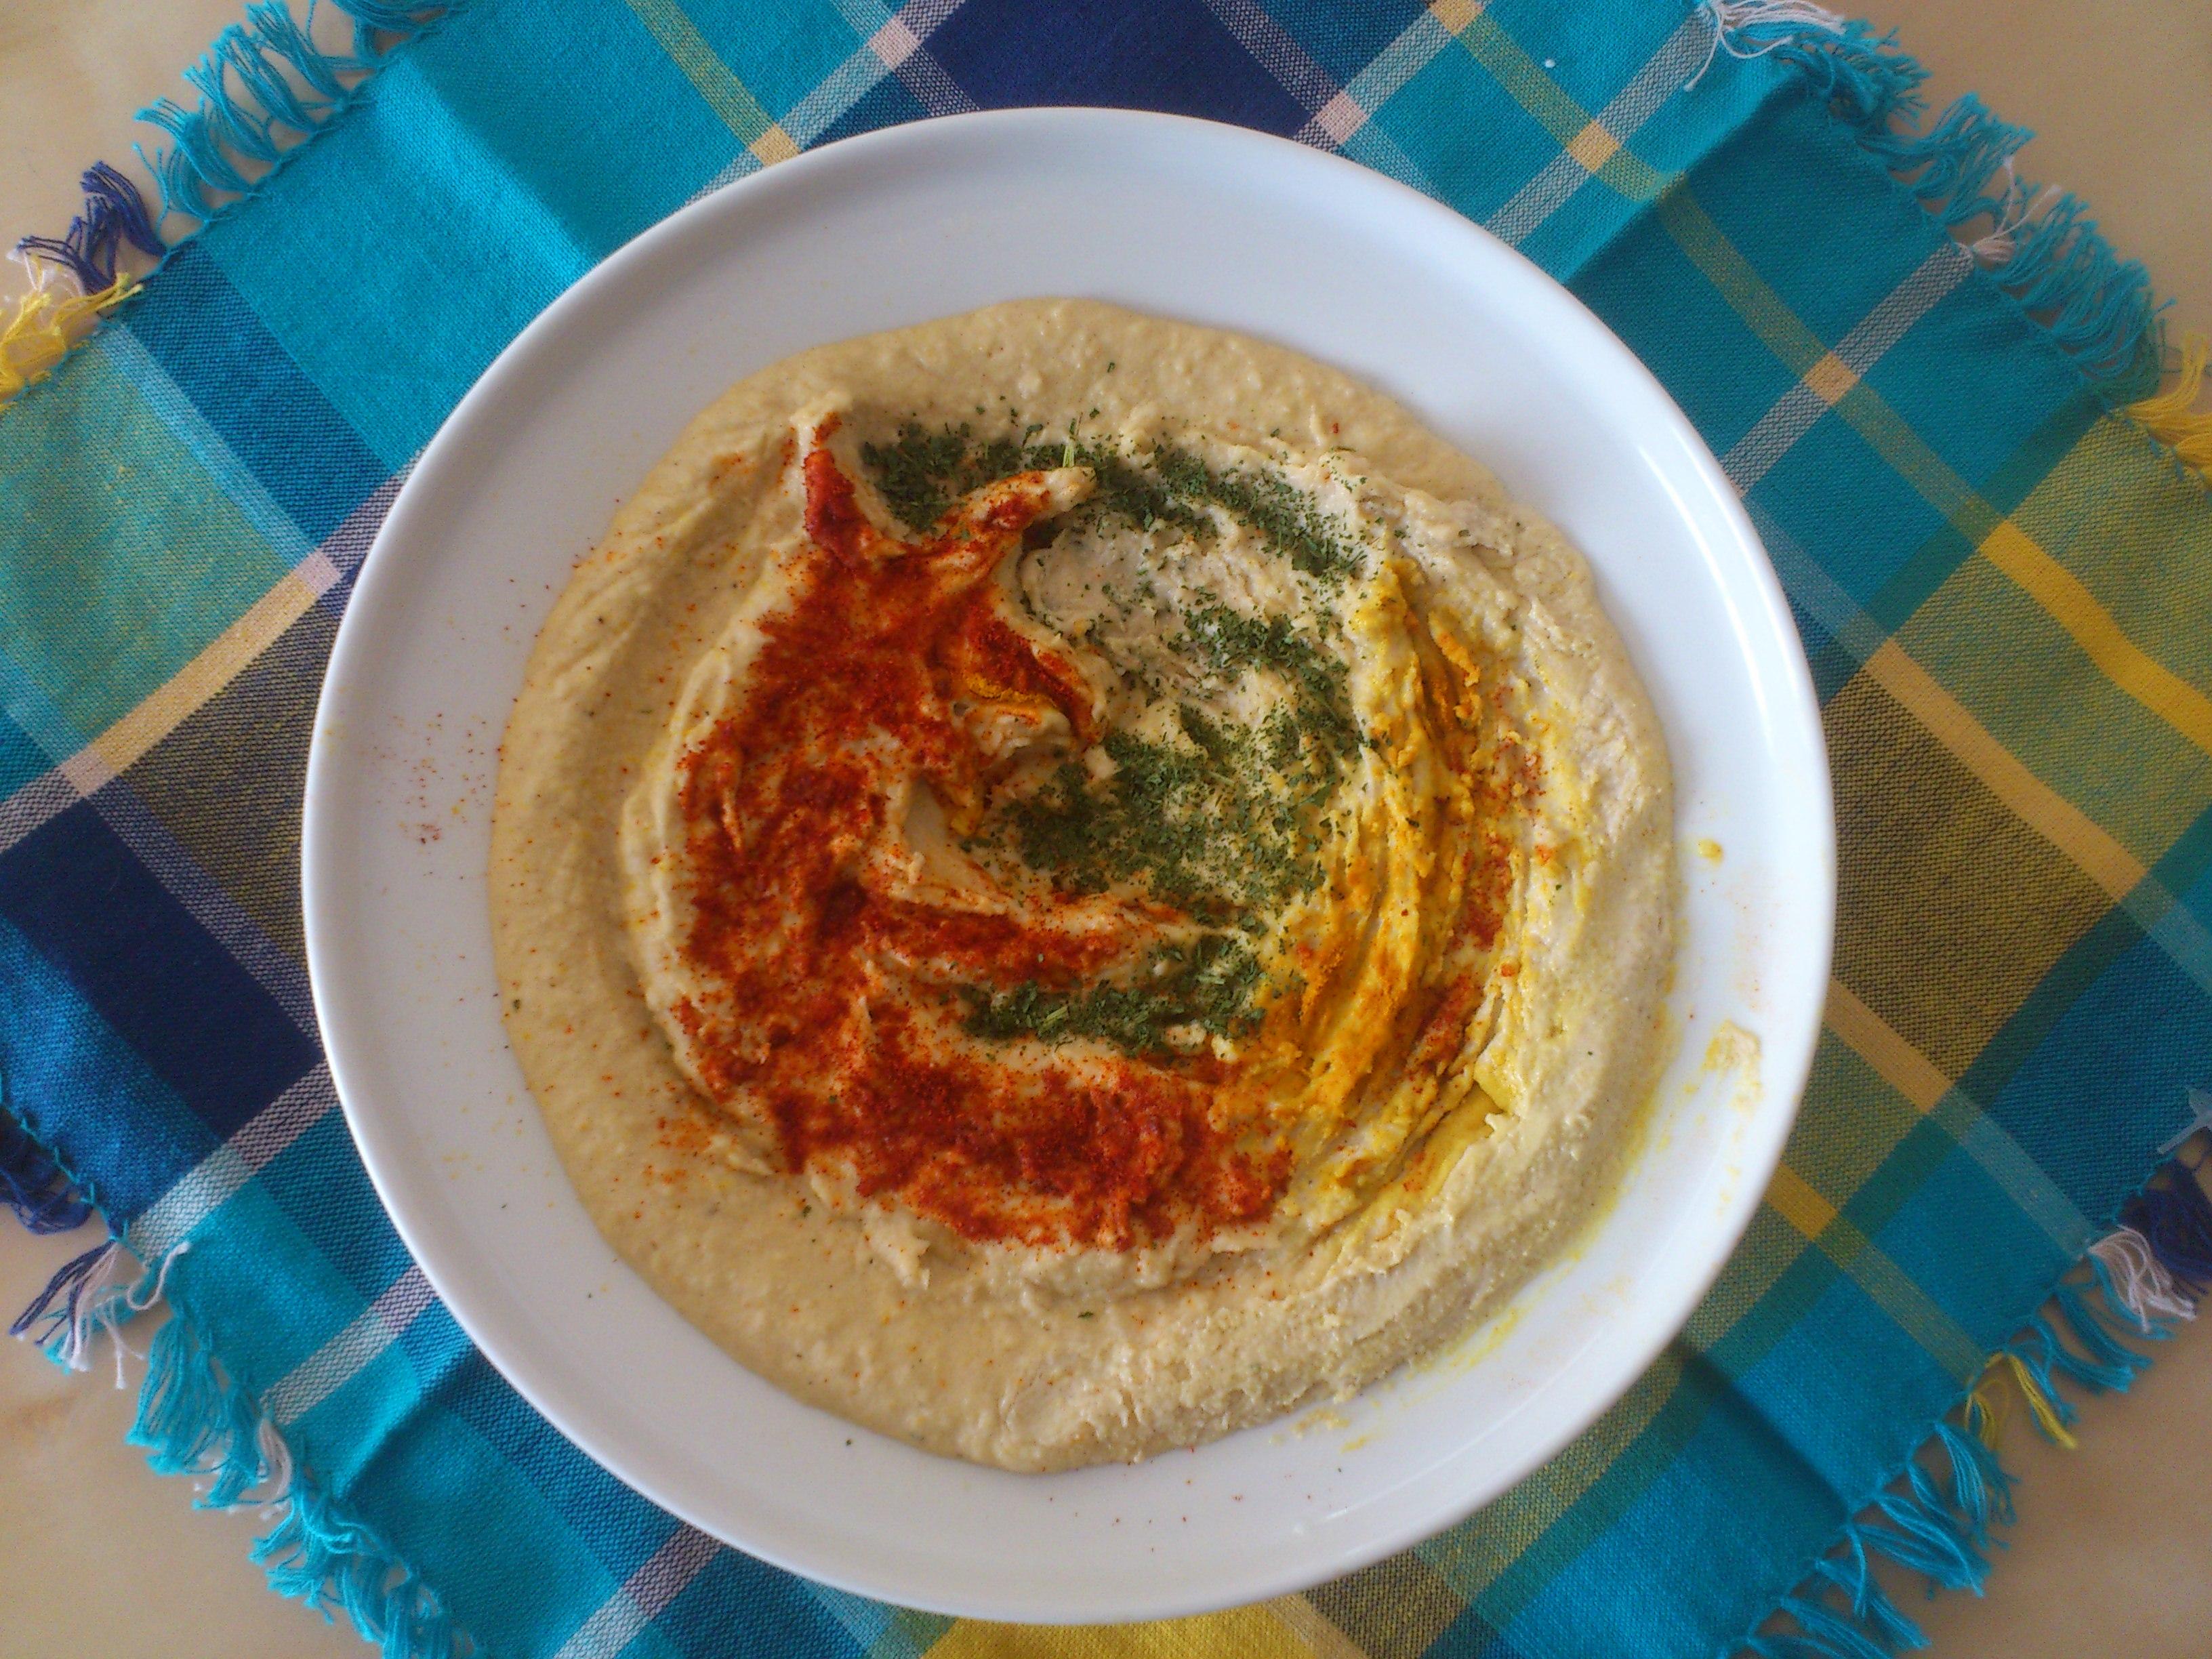 a plate of home-made hummus, with seasoning in the shape of Mozilla Firefox logo / צלחת חומוס עם תיבול בצורת הסמל של מוזילה פיירפוקס